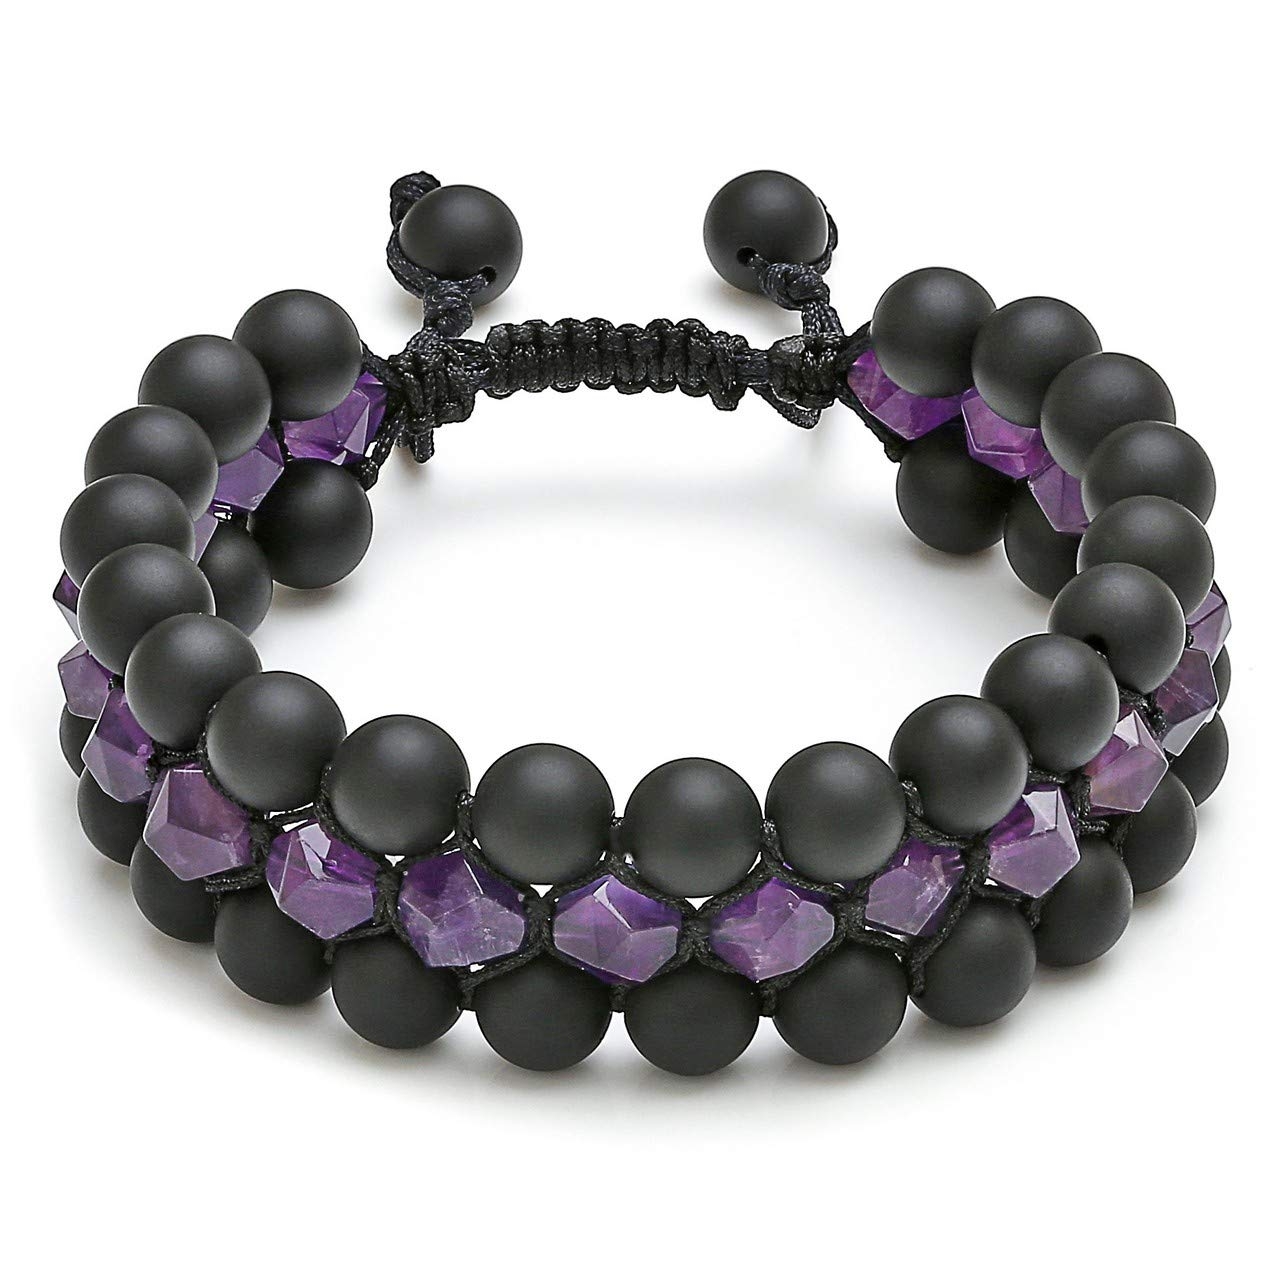 CAT EYE JEWELS Mens Beaded Bracelets Adjustable Layered 8mm Natural Healing Stones Beads for Men Women